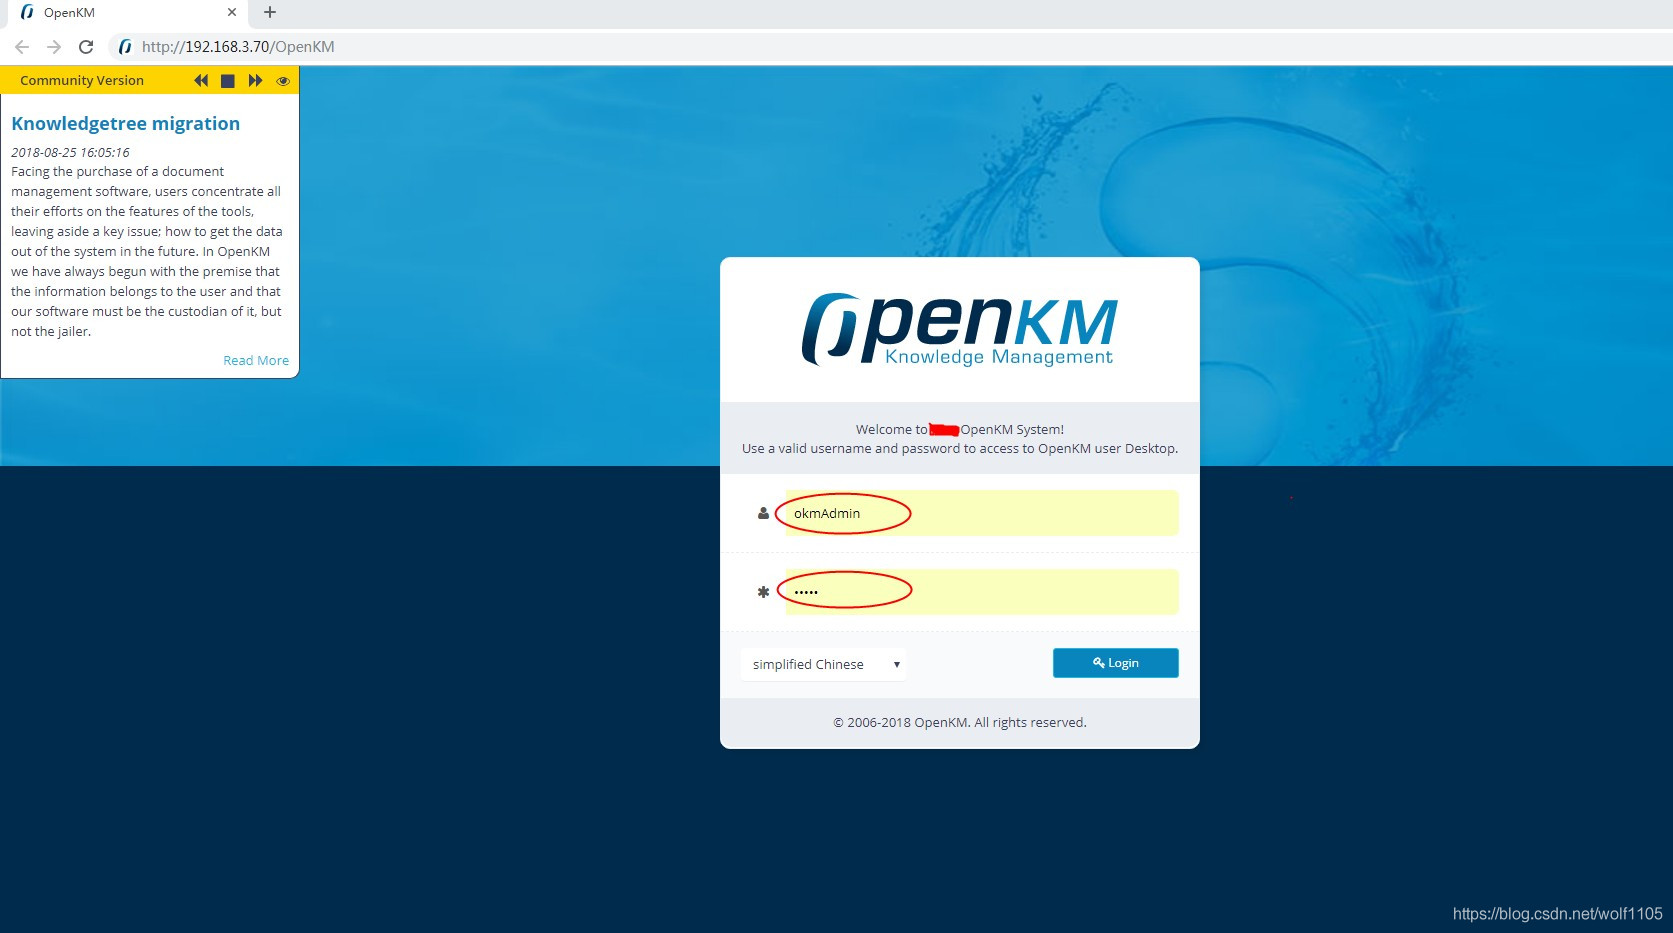 OpenKM login